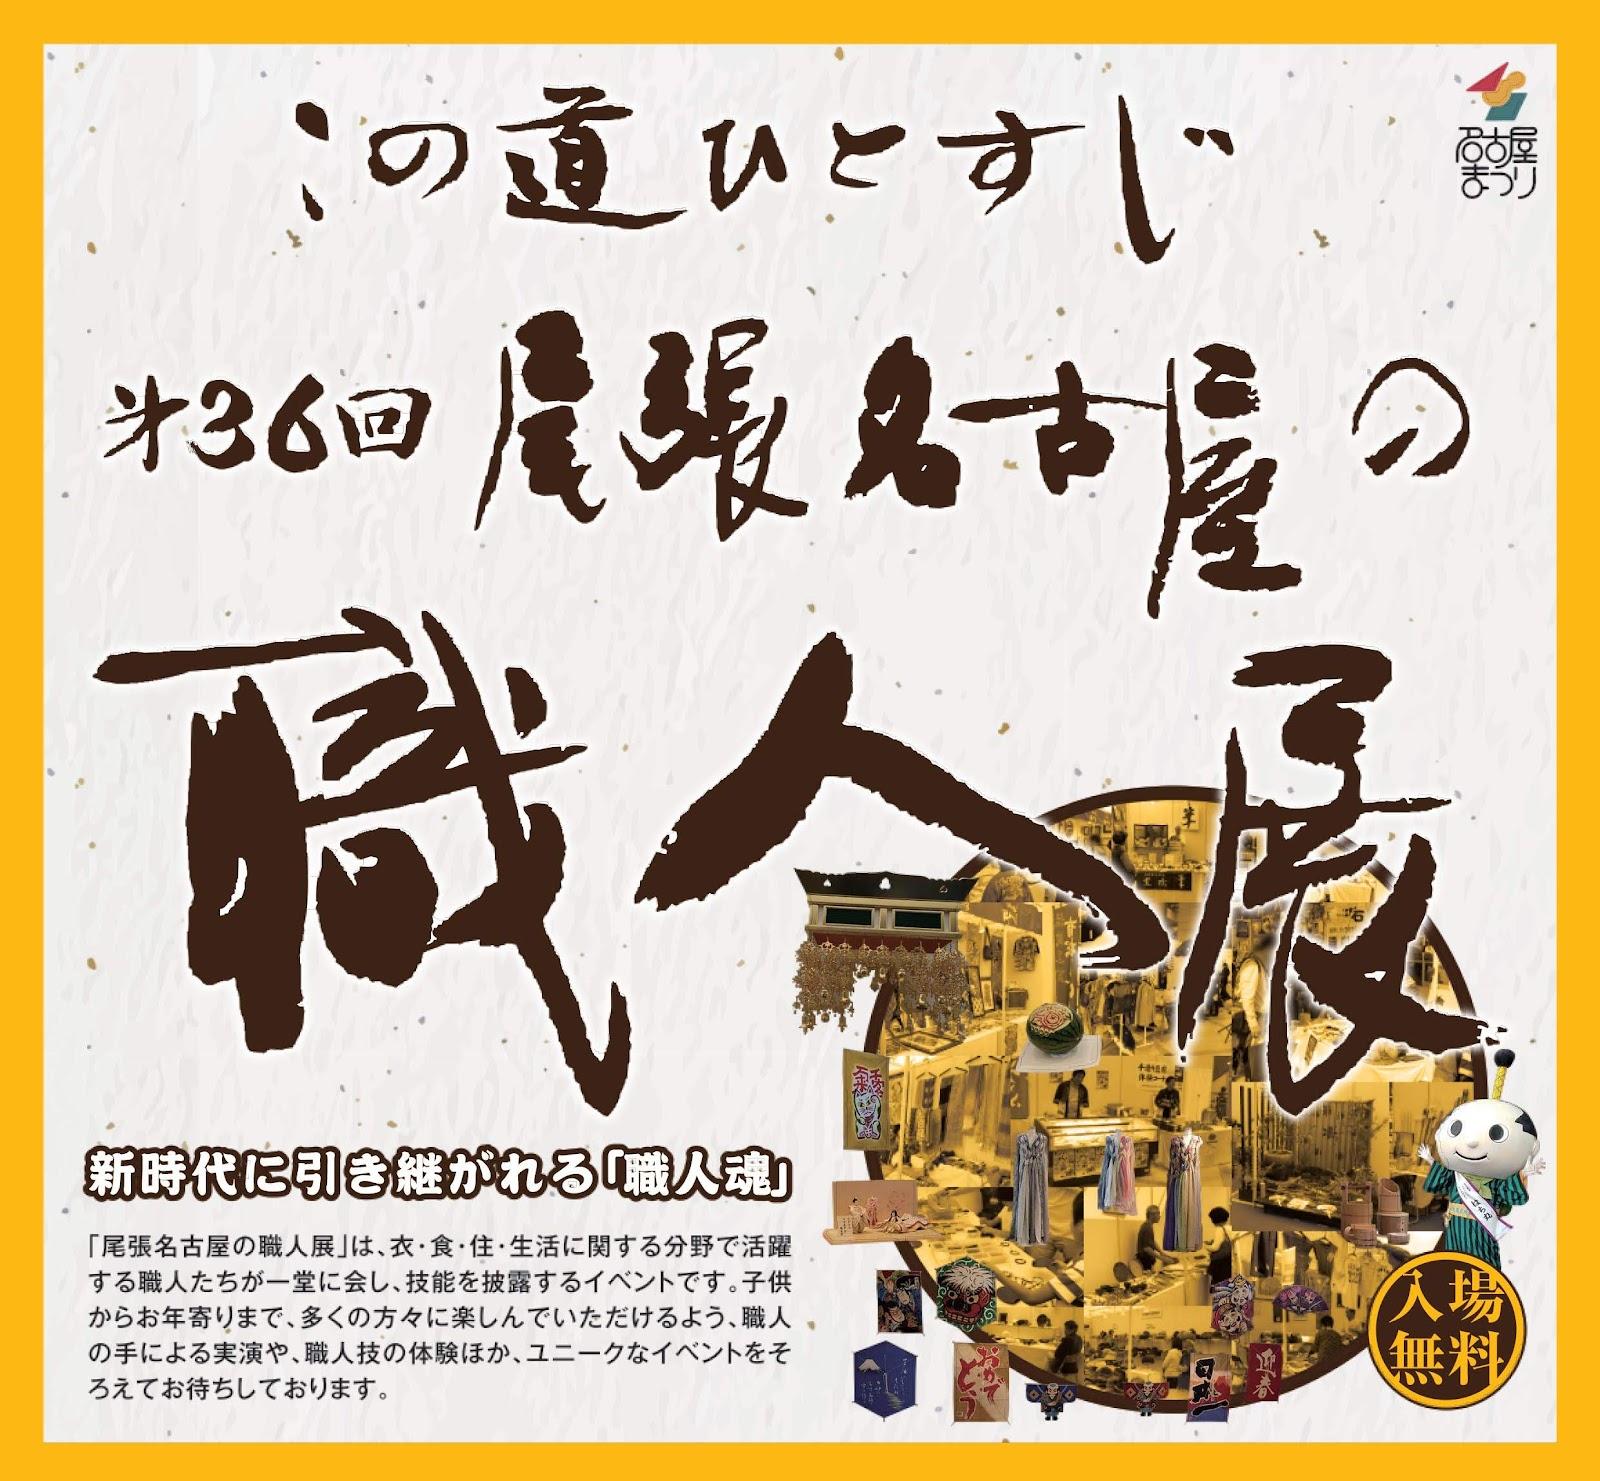 第36回 尾張名古屋の職人展 2019年